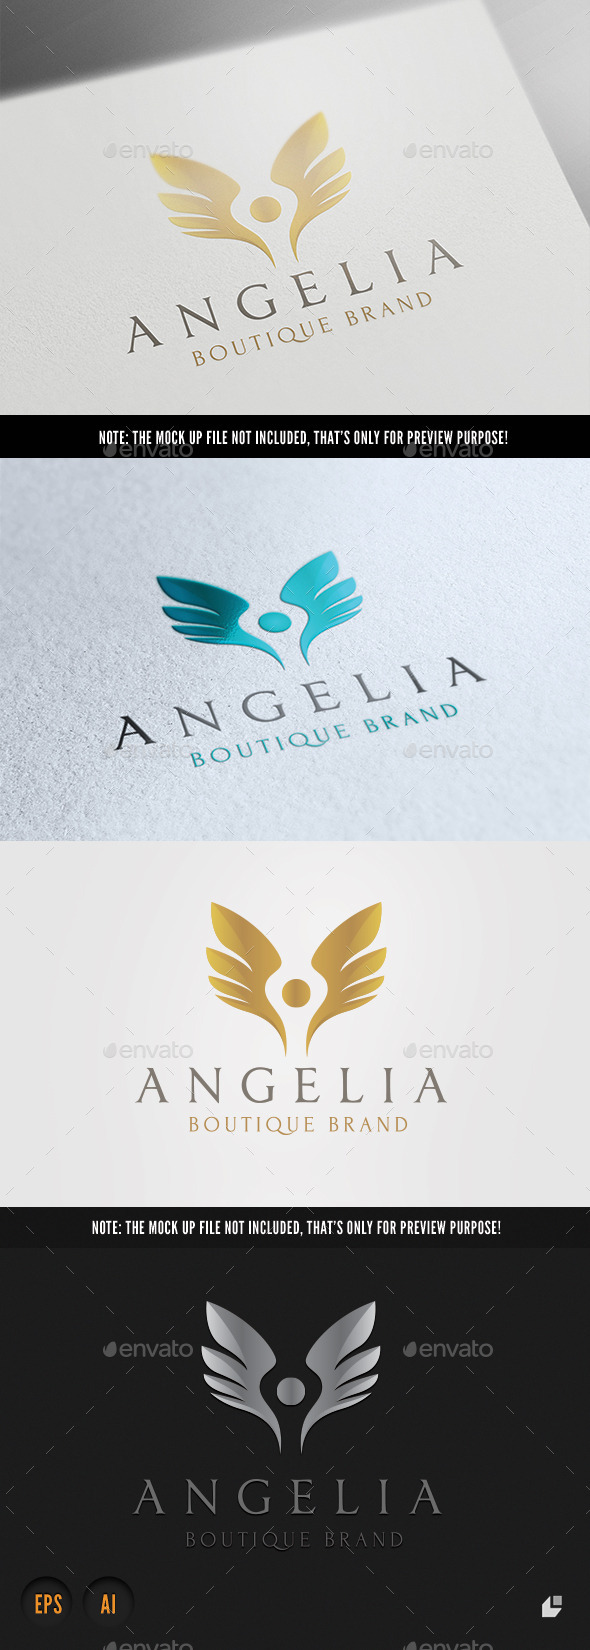 Boutique Brand - Crests Logo Templates